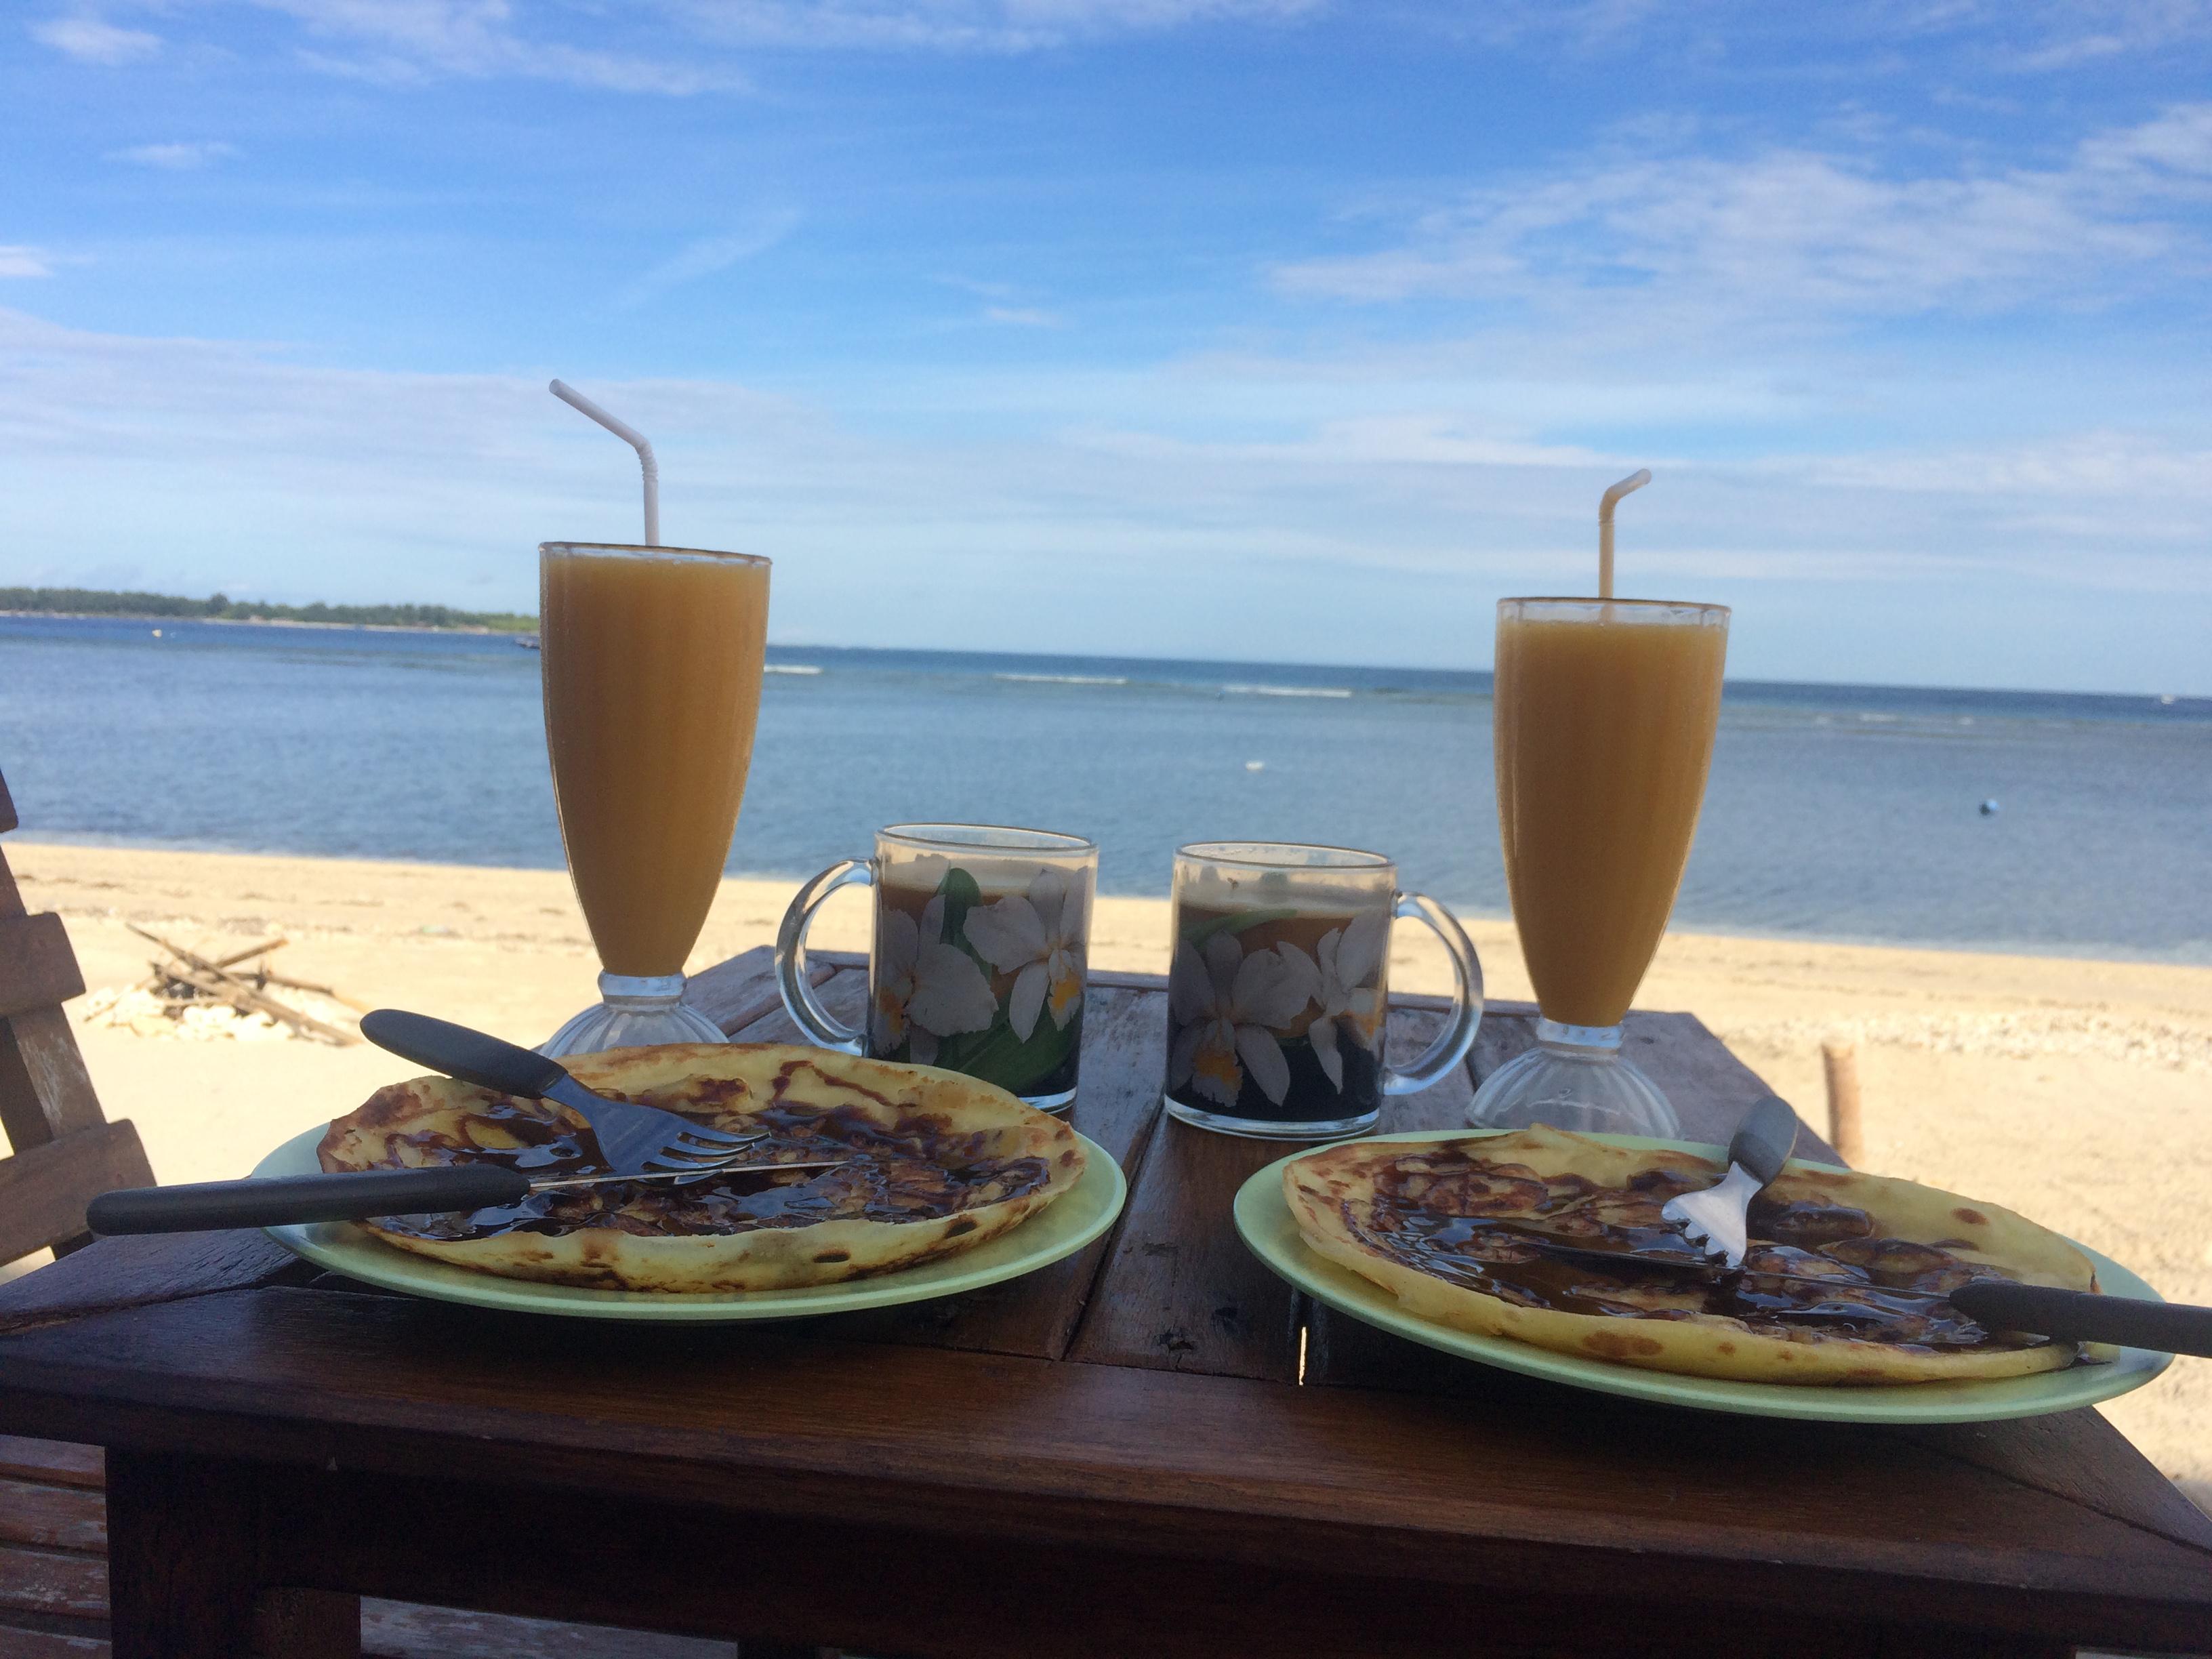 Hôtel Gili Air Matahari 1, Déjeuner bord de plage, Indonésie